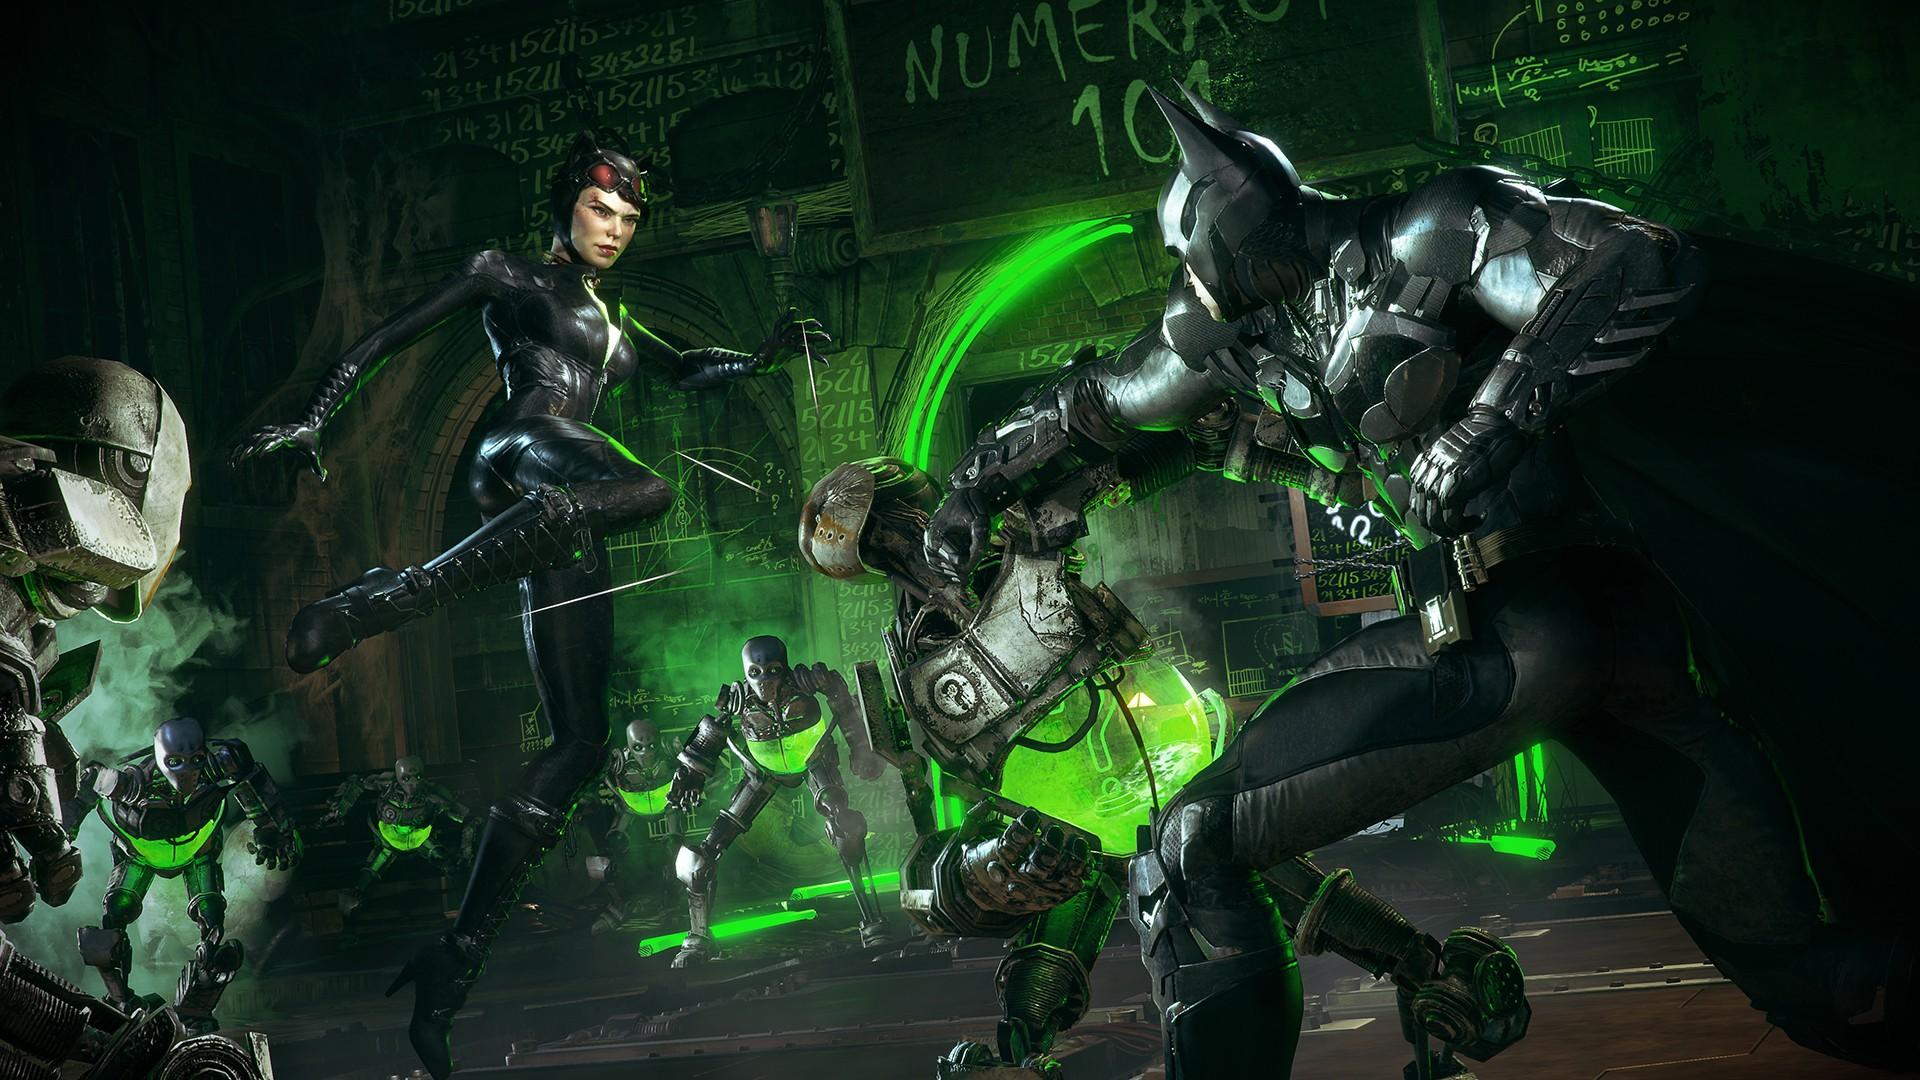 The Riddler Batman Arkham Knight Catwoman Gotham City